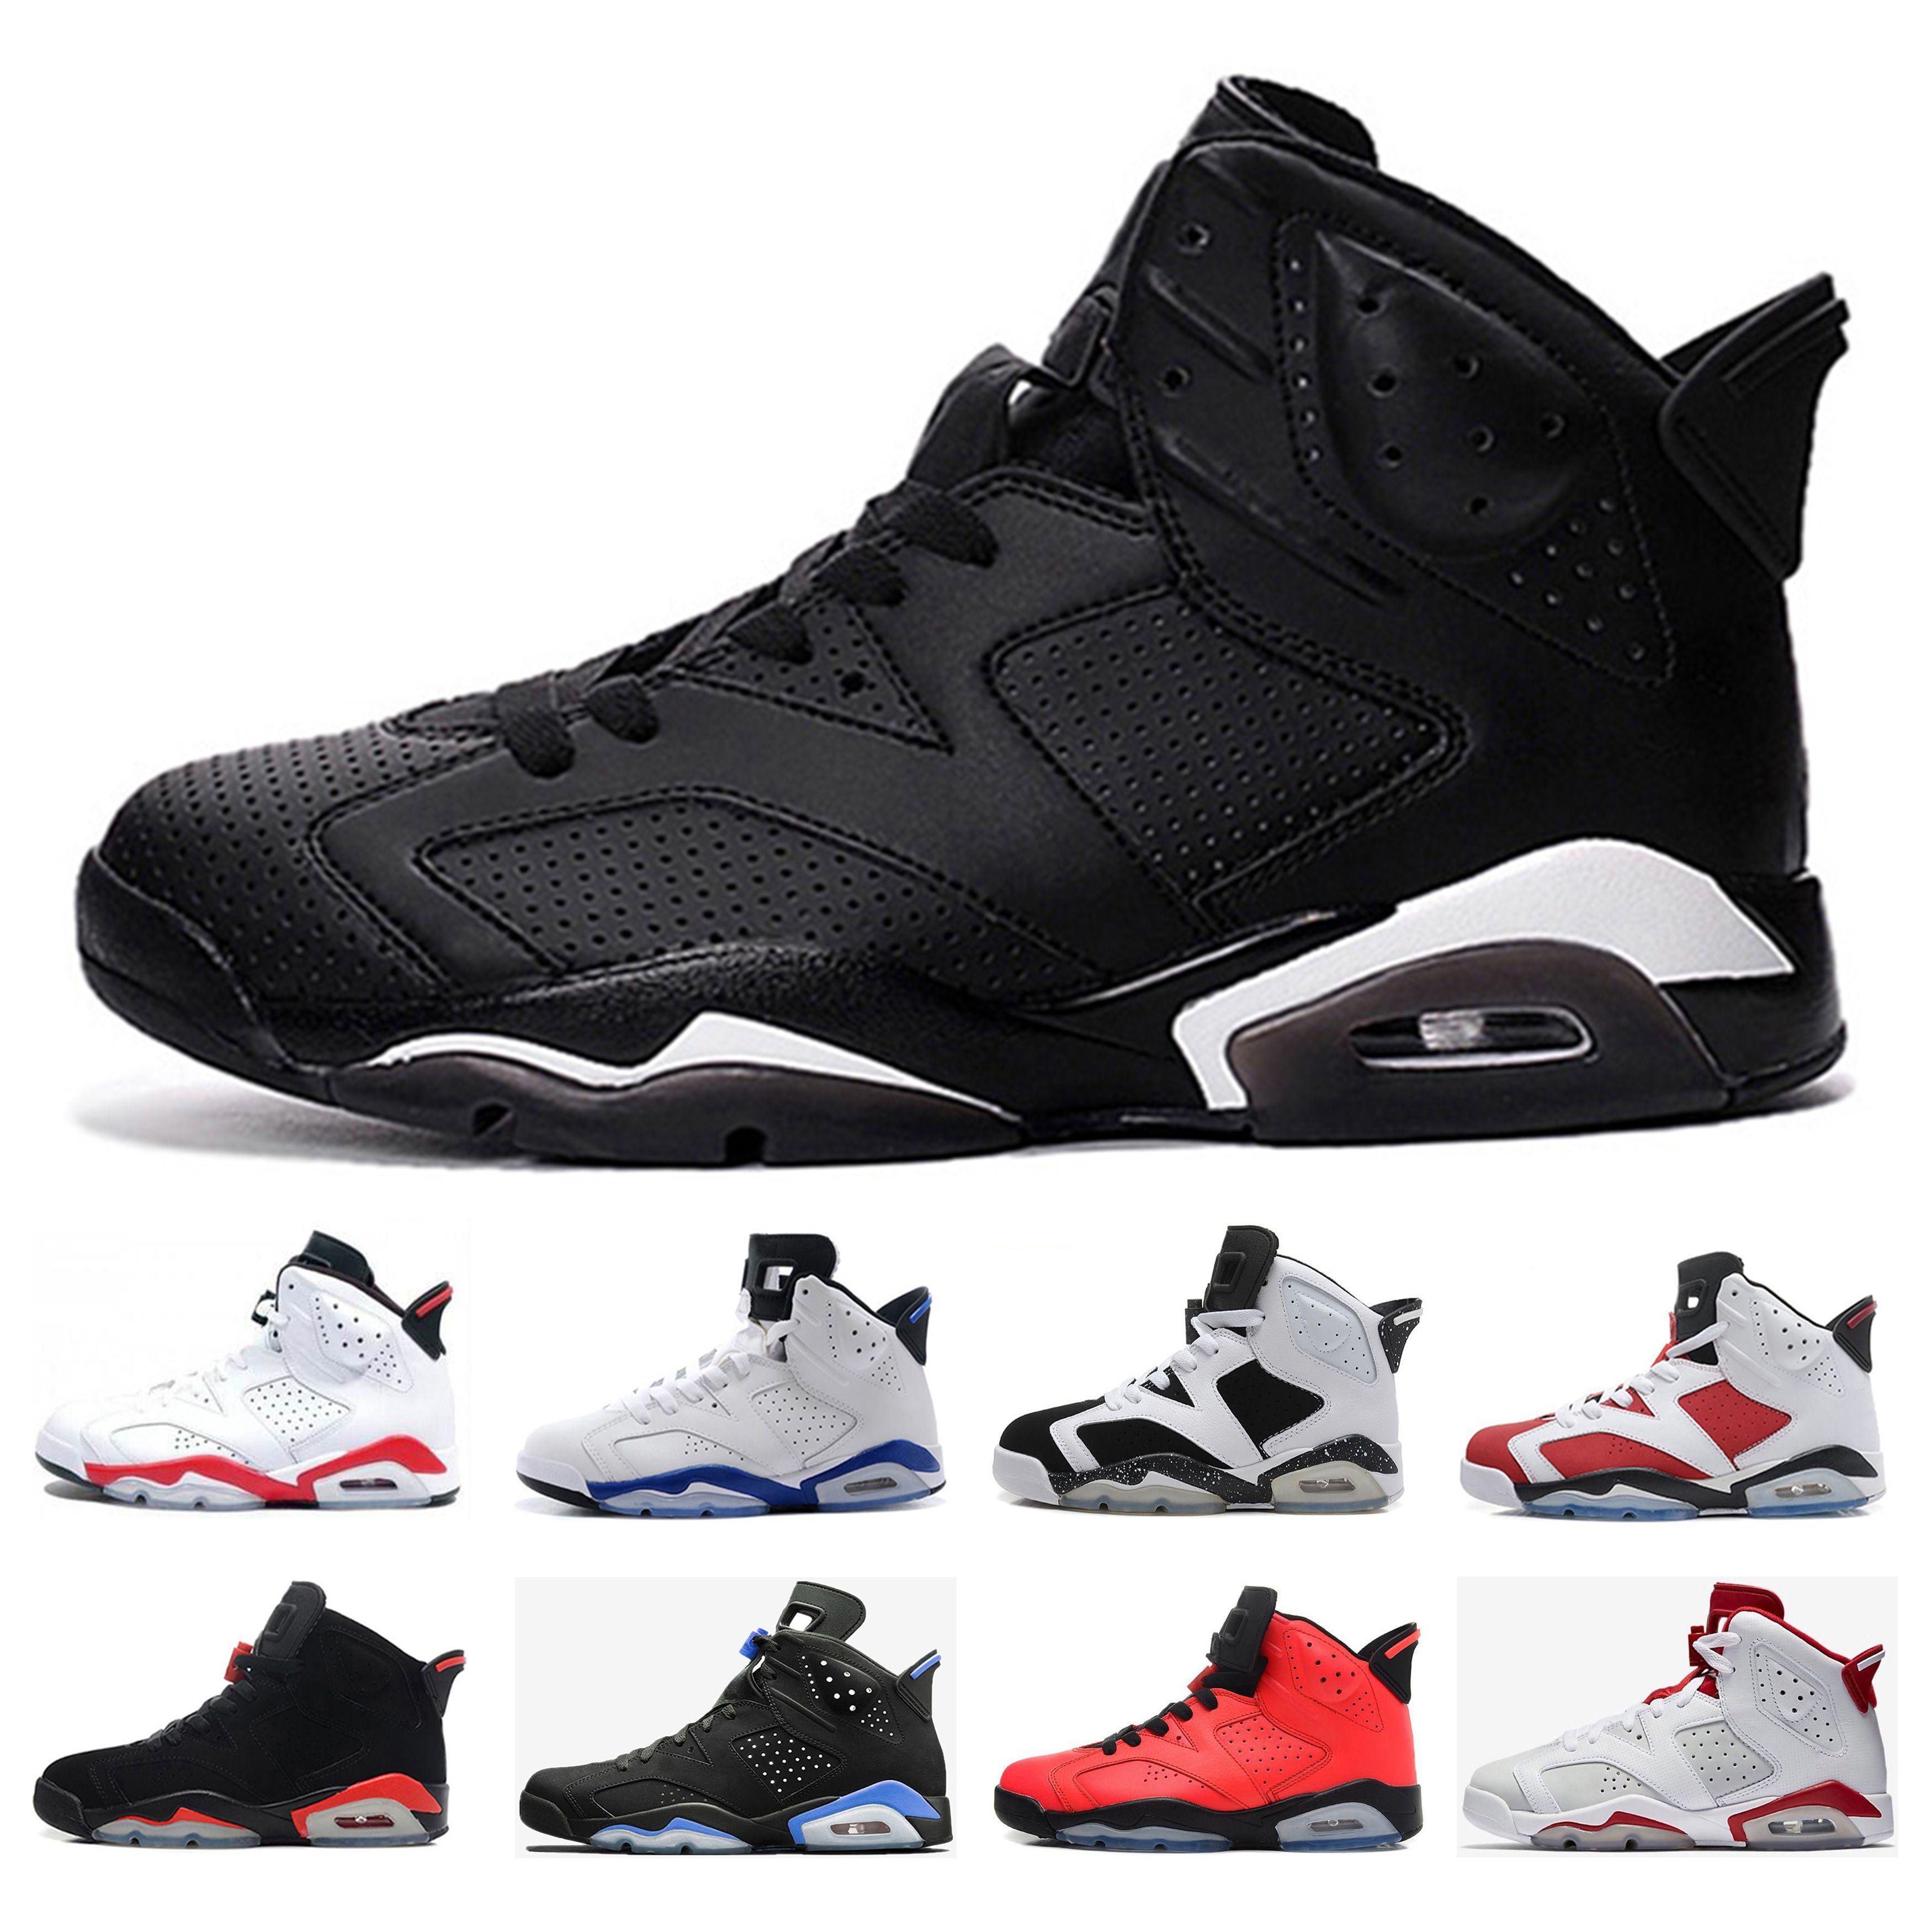 best sneakers 075c7 326ec Newest 6 6s mens Basketall Shoes Black Infrared UNC Black cat Maroon  Carmine Alternate Hare Olympic Oreo high Athletic Sport Sneaker US 8-13